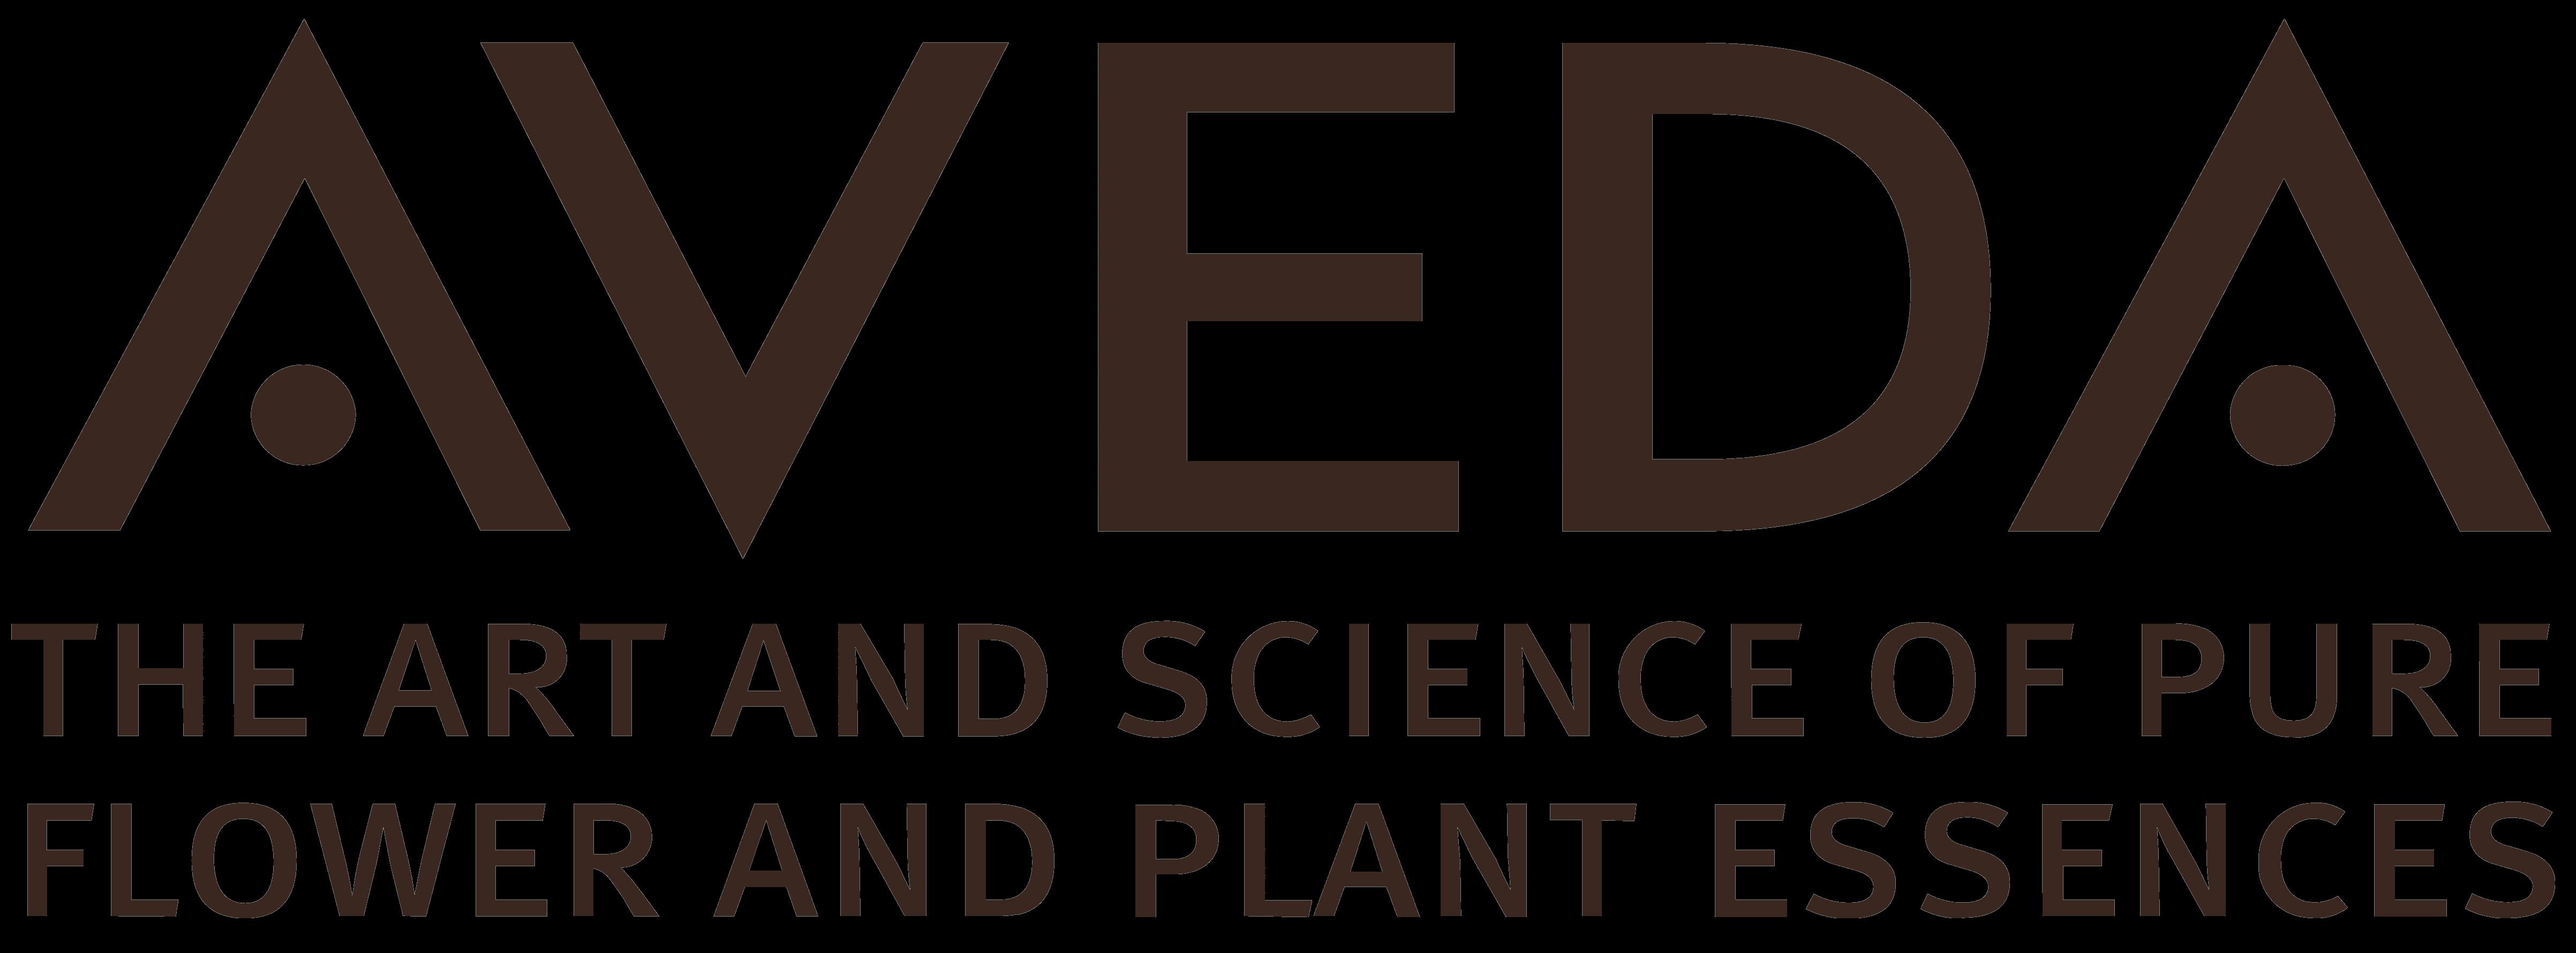 XVADA Logo photo - 1